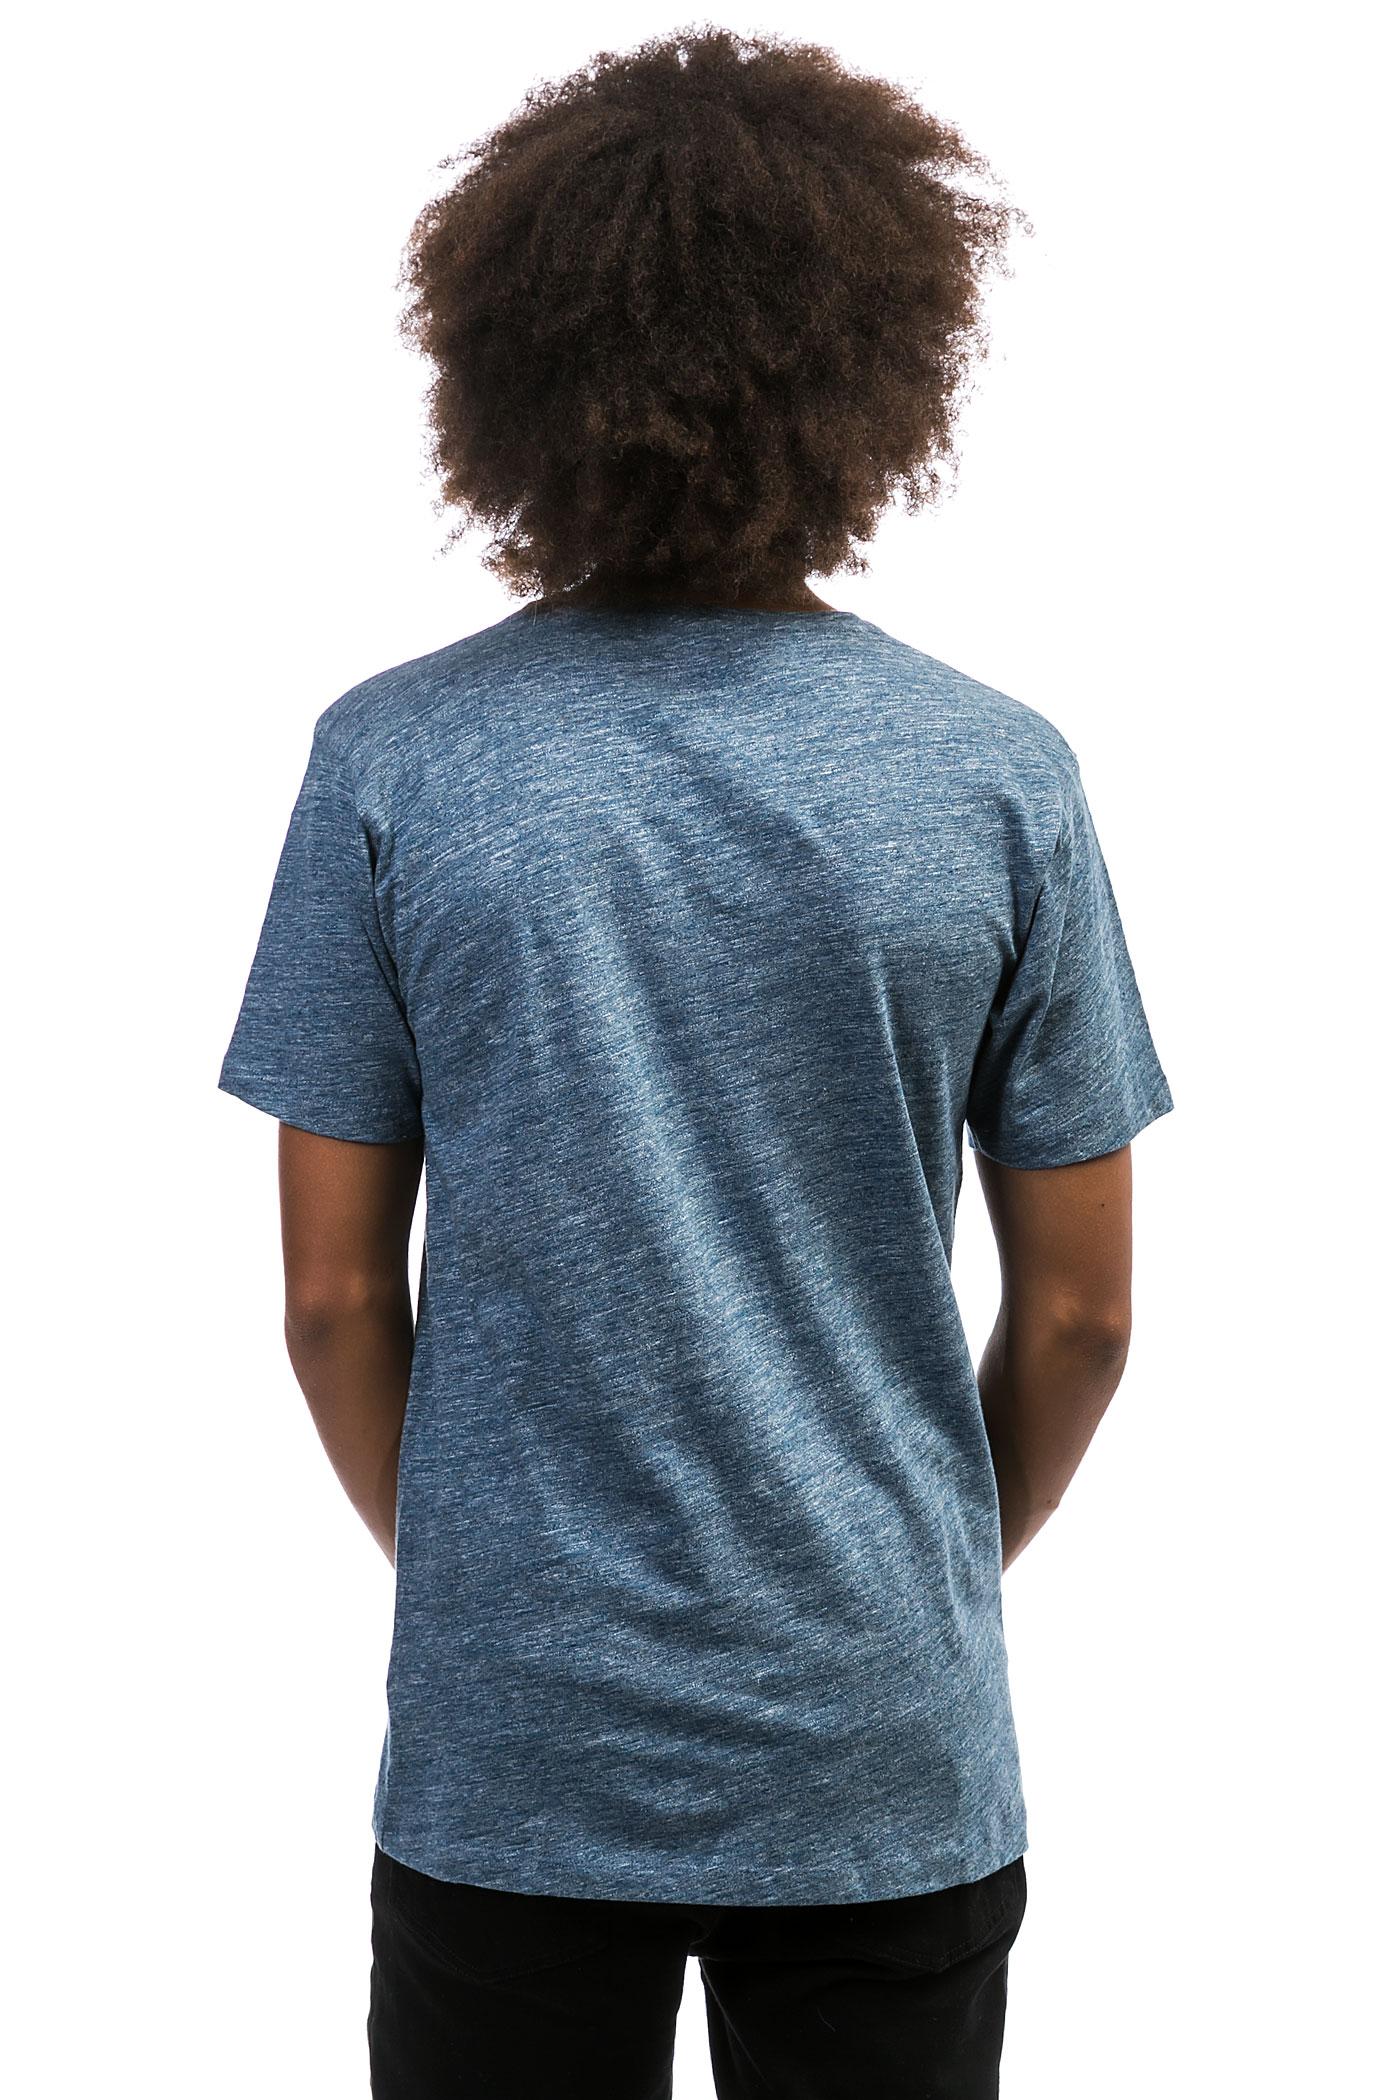 Cleptomanicx vintage print t shirt vintage blue kaufen for Vintage t shirt printing